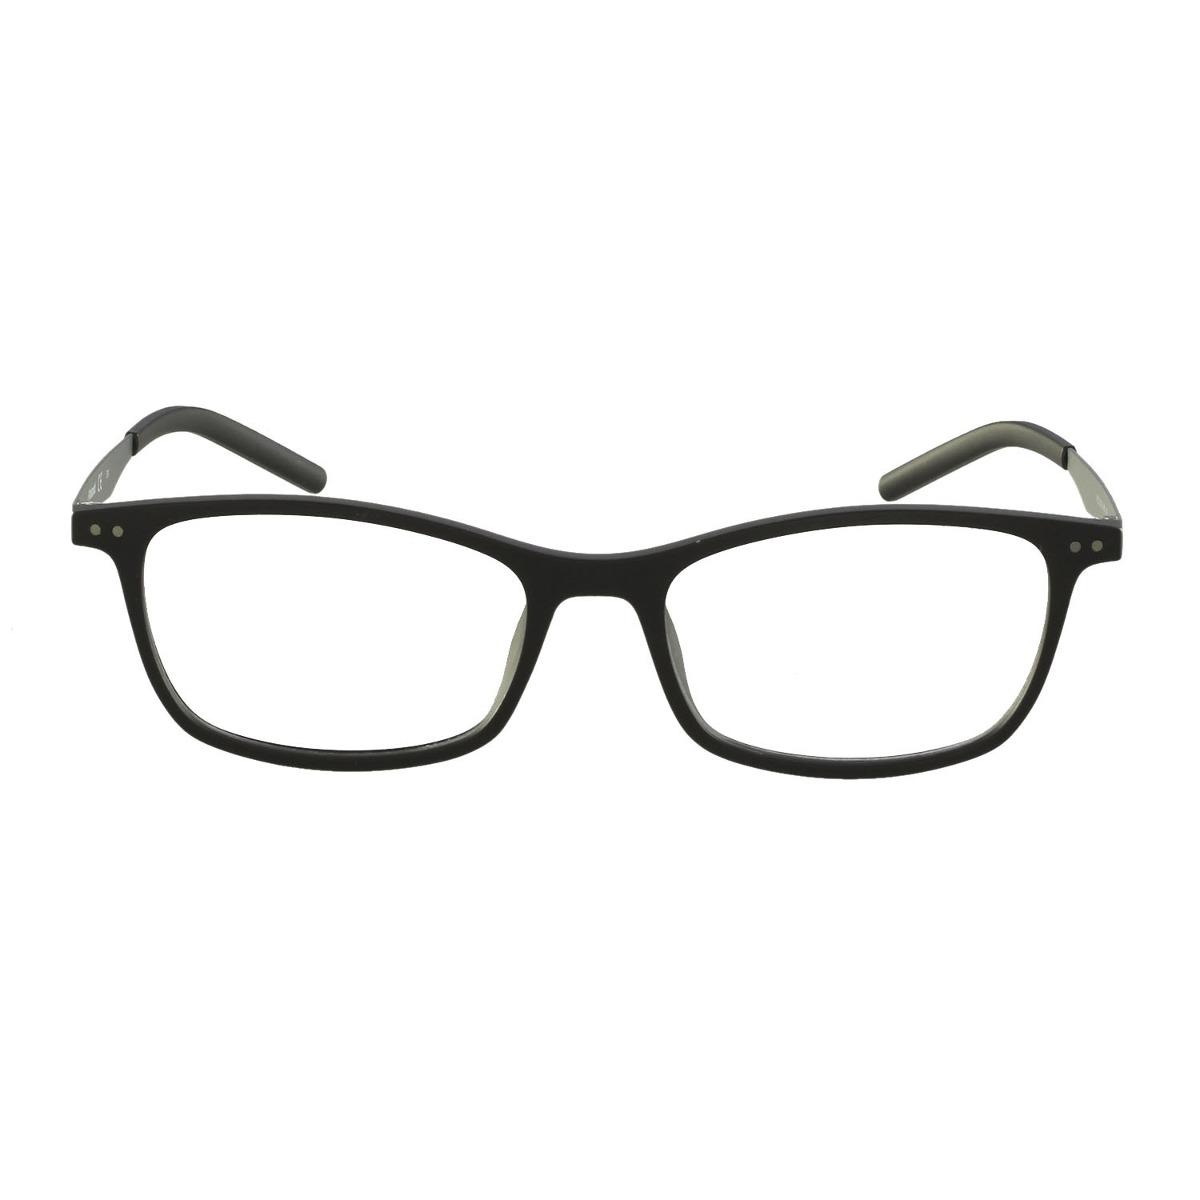 Óculos De Grau Polaroid Casual Preto 31522000 - R  199,00 em Mercado ... d1862d3a58